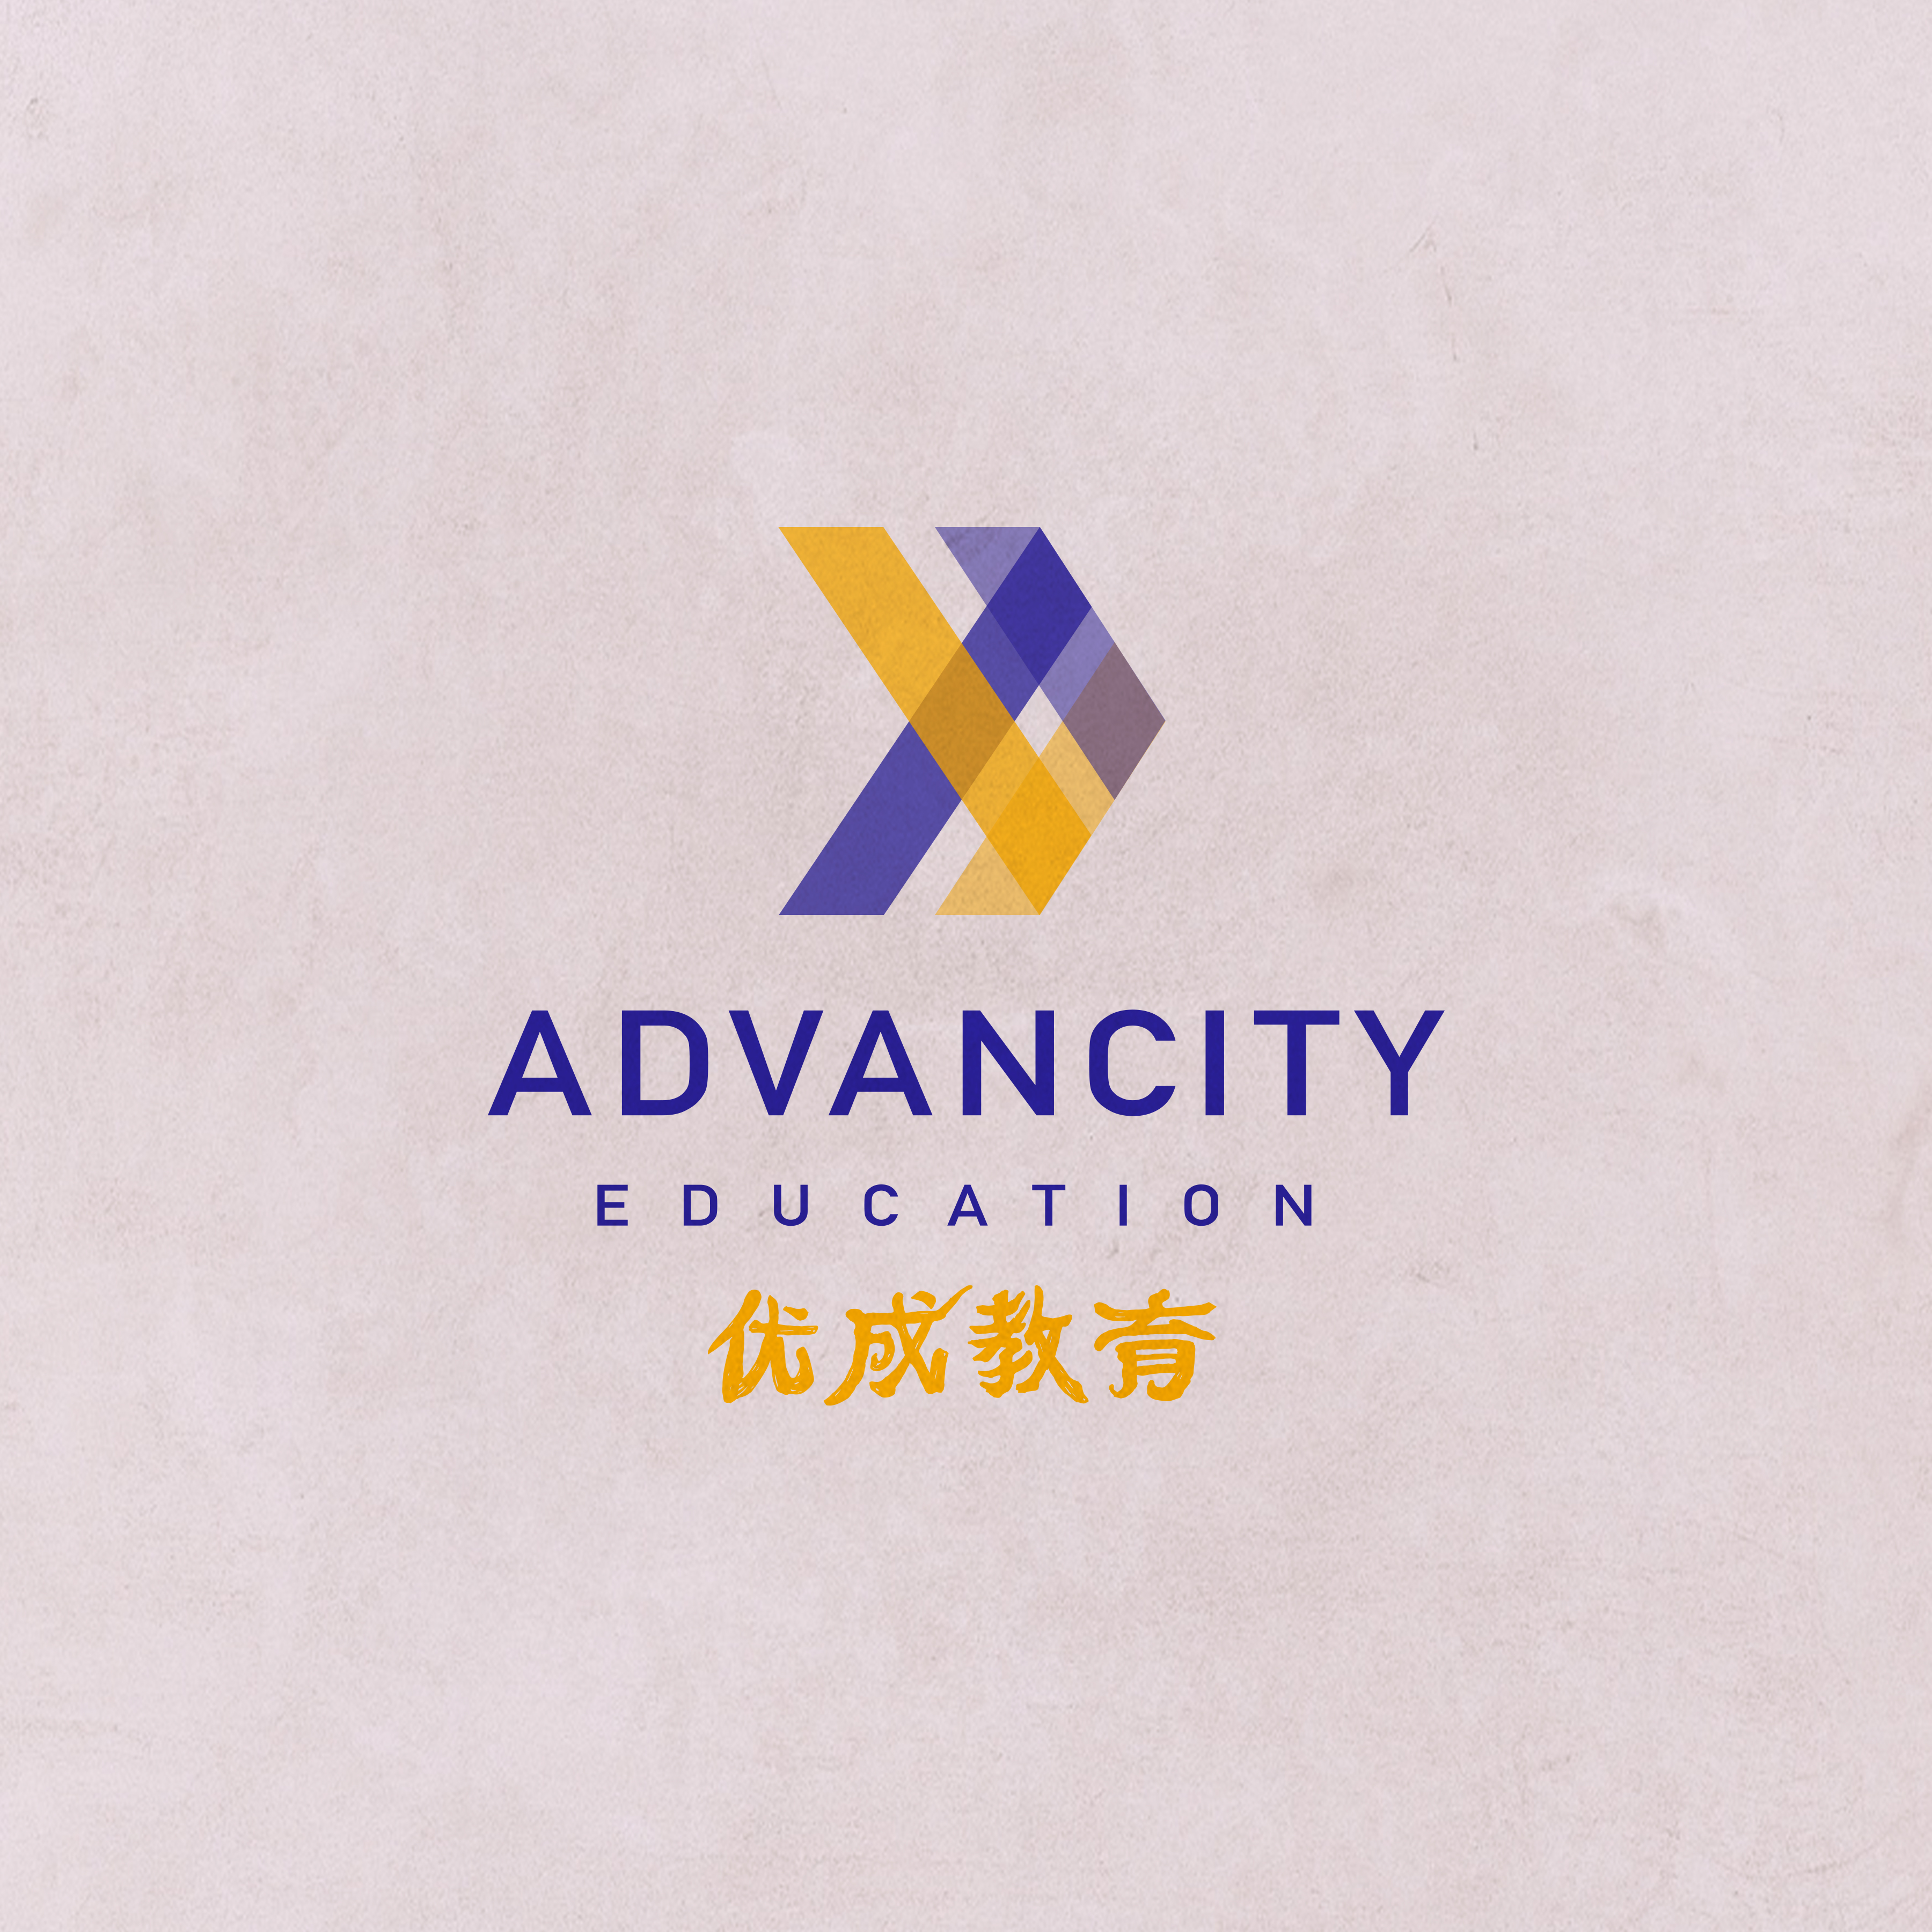 ANerdsWorld_Logos_Advancity